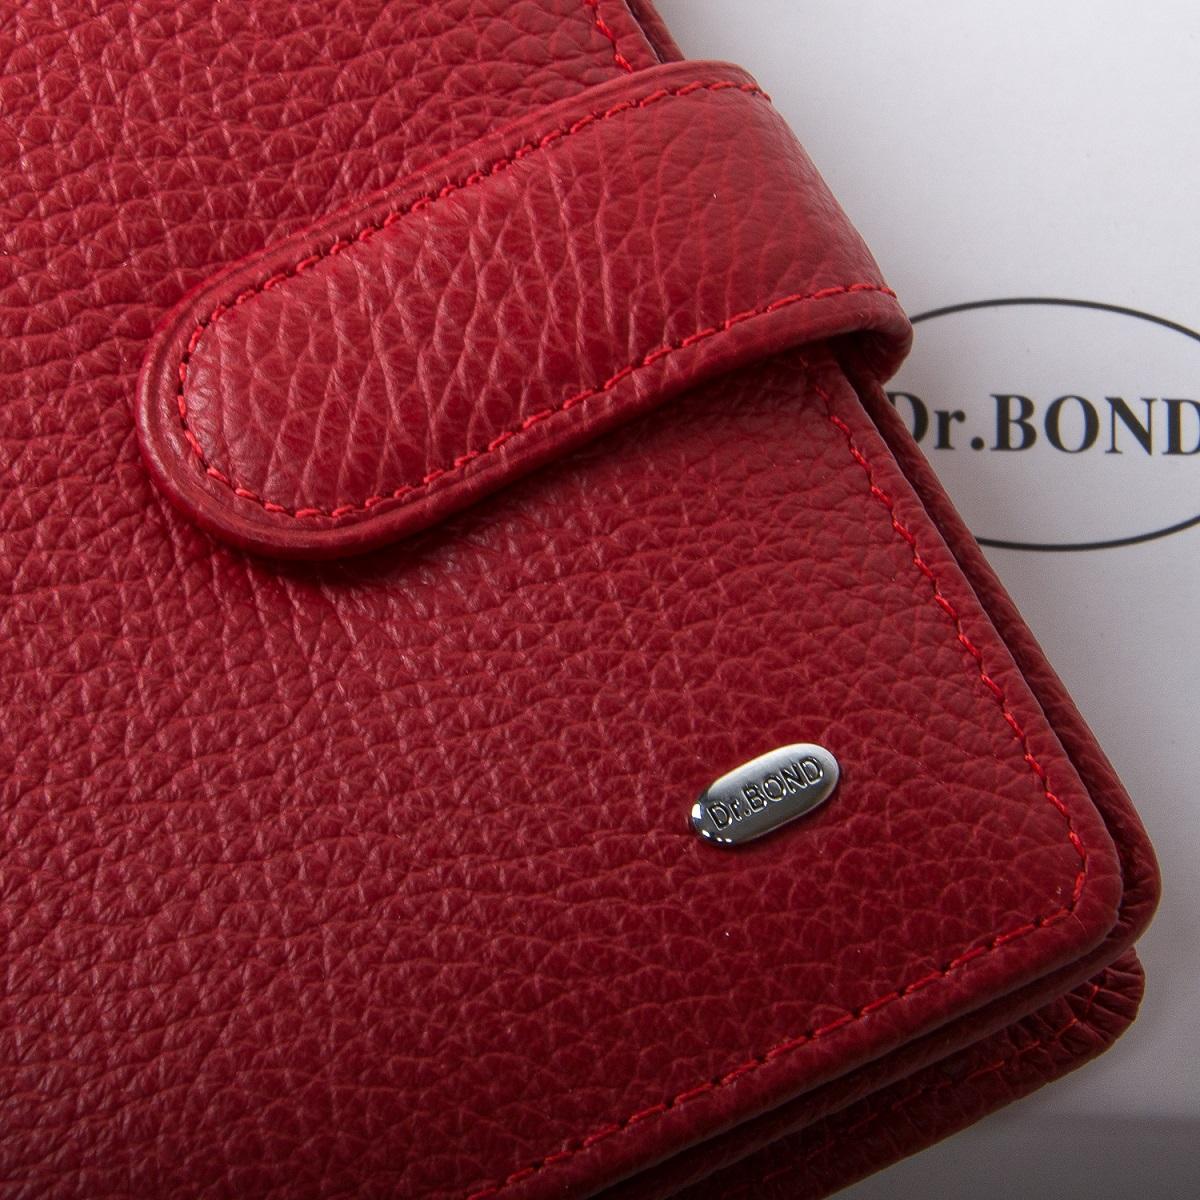 Кошелек Classic кожа DR. BOND WN-2 red - фото 4